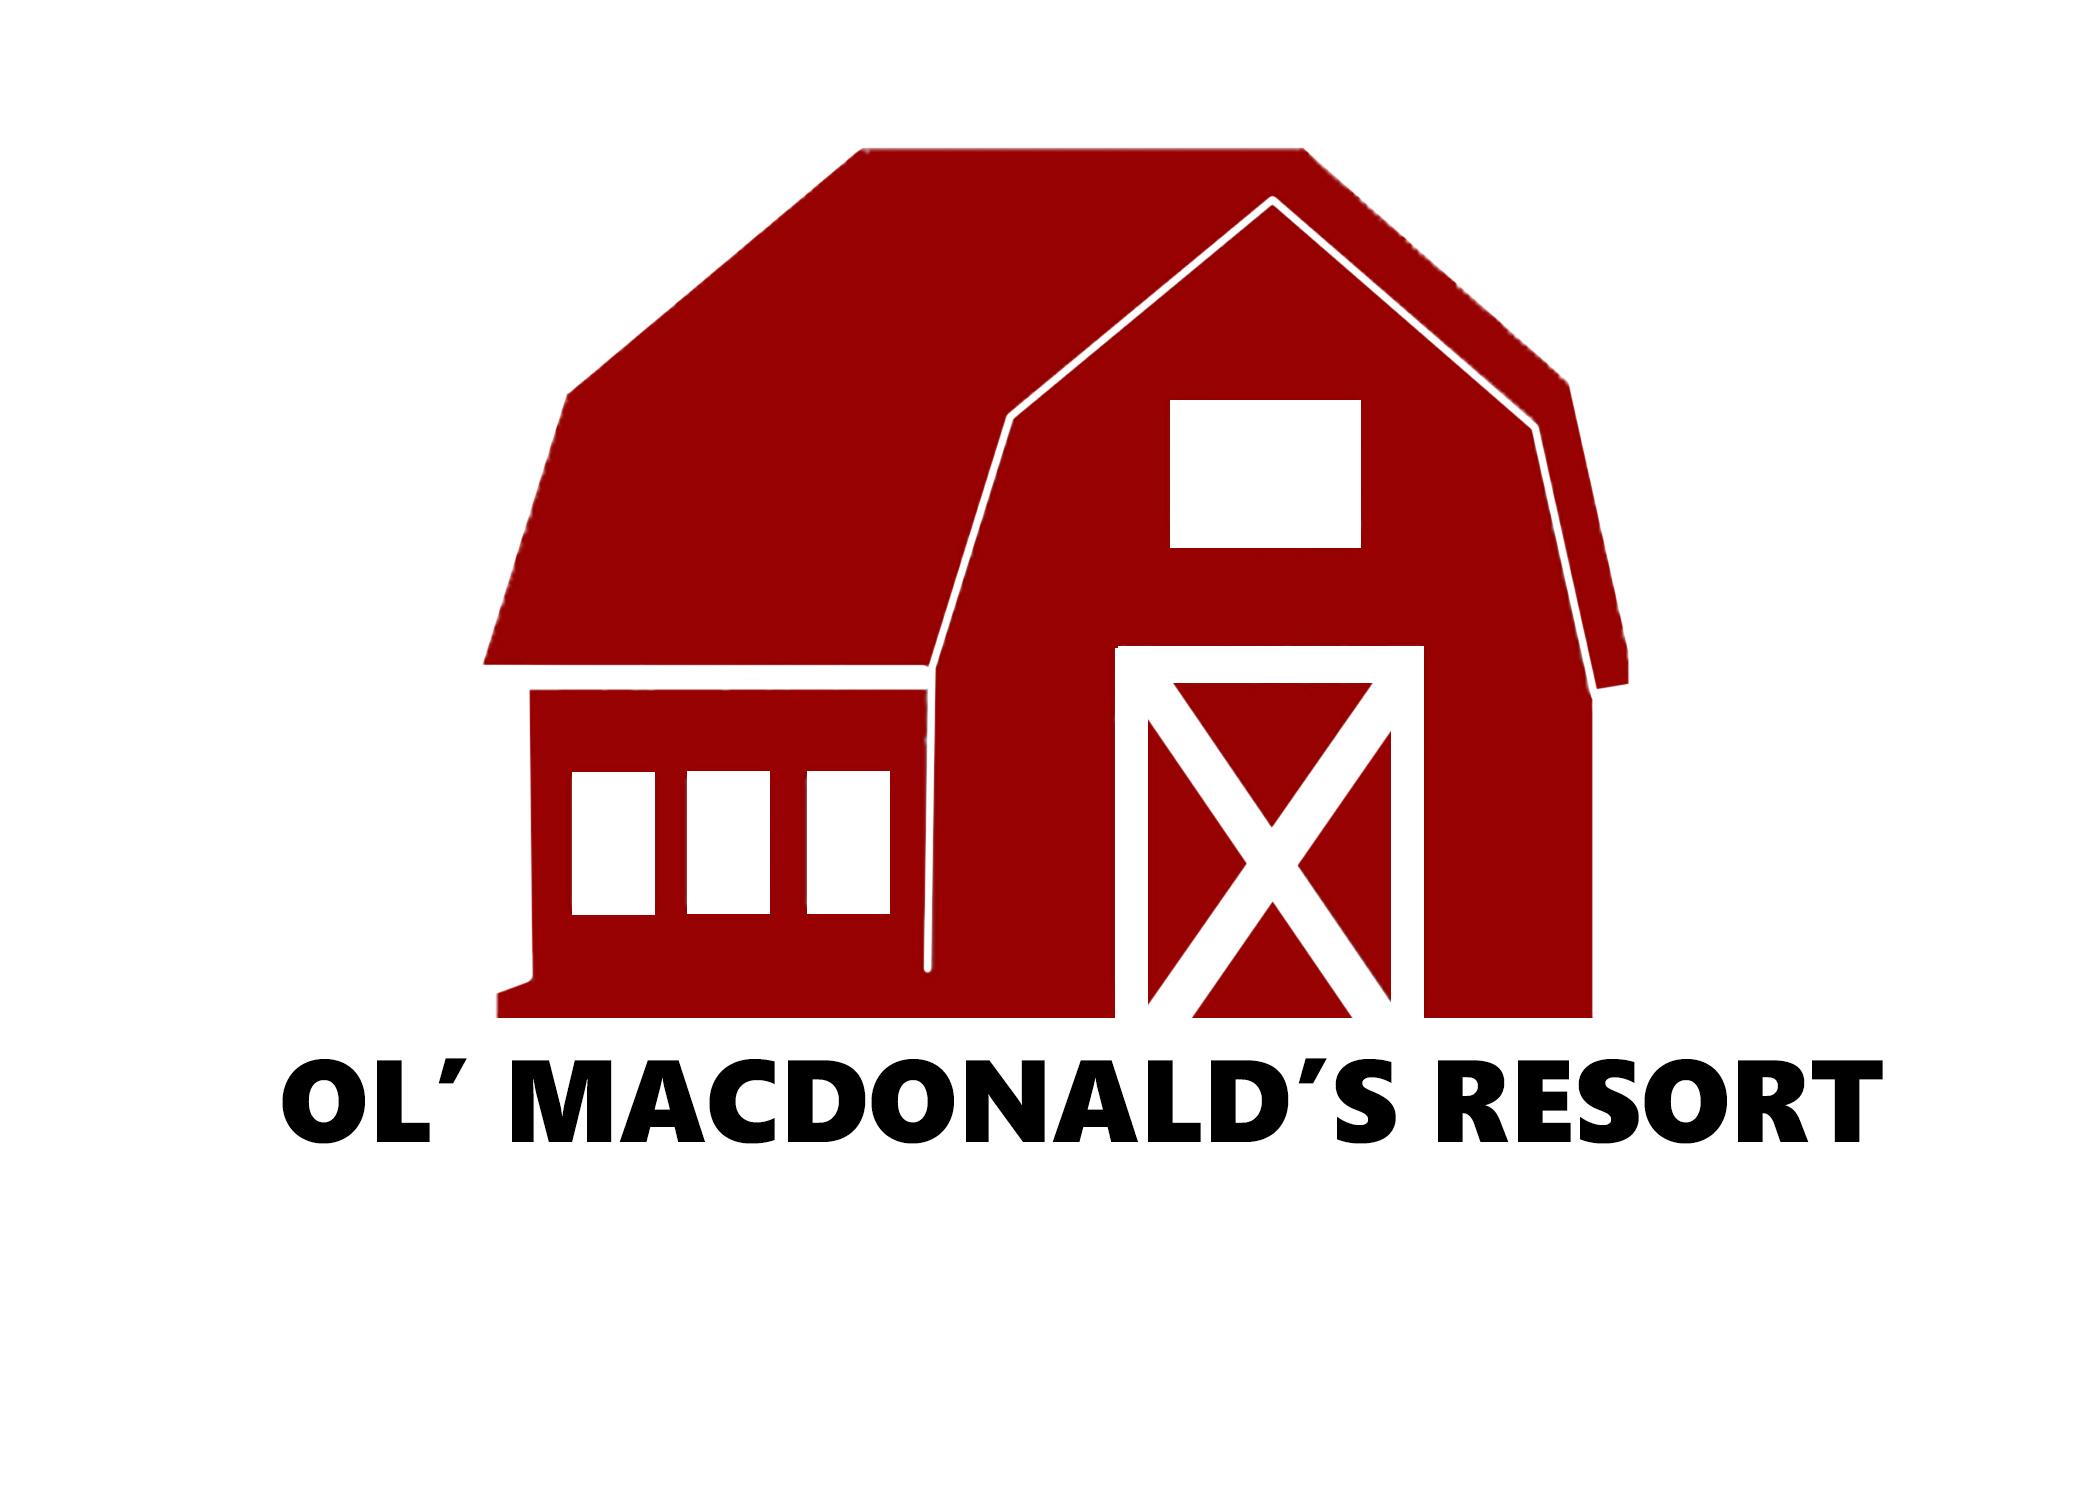 old mac logo.jpg (389 KB)